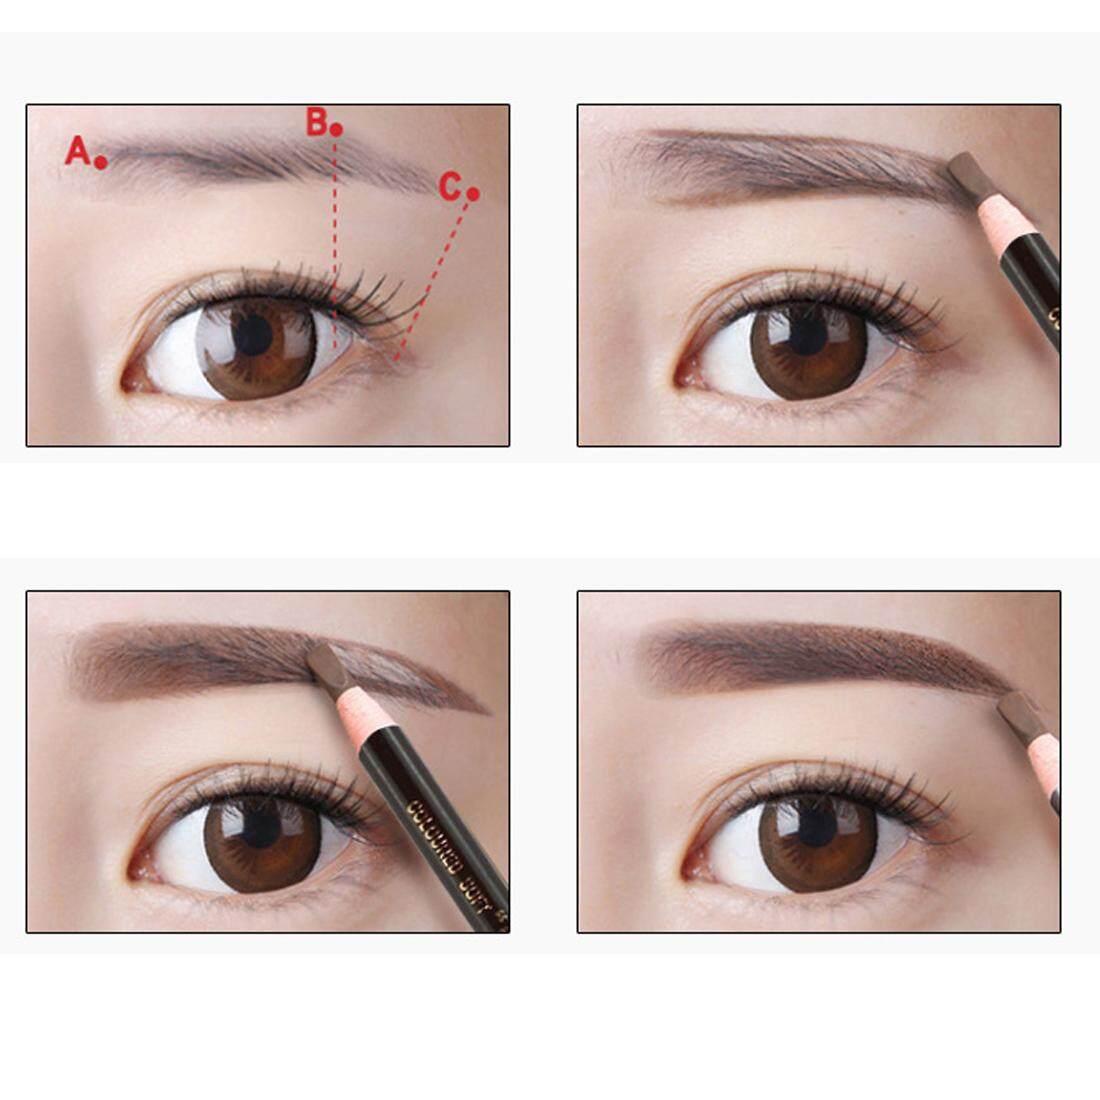 New Waterproof Cosmetics Eyebrow Pencil Eyeliner Eyebrow Pen - intl Philippines